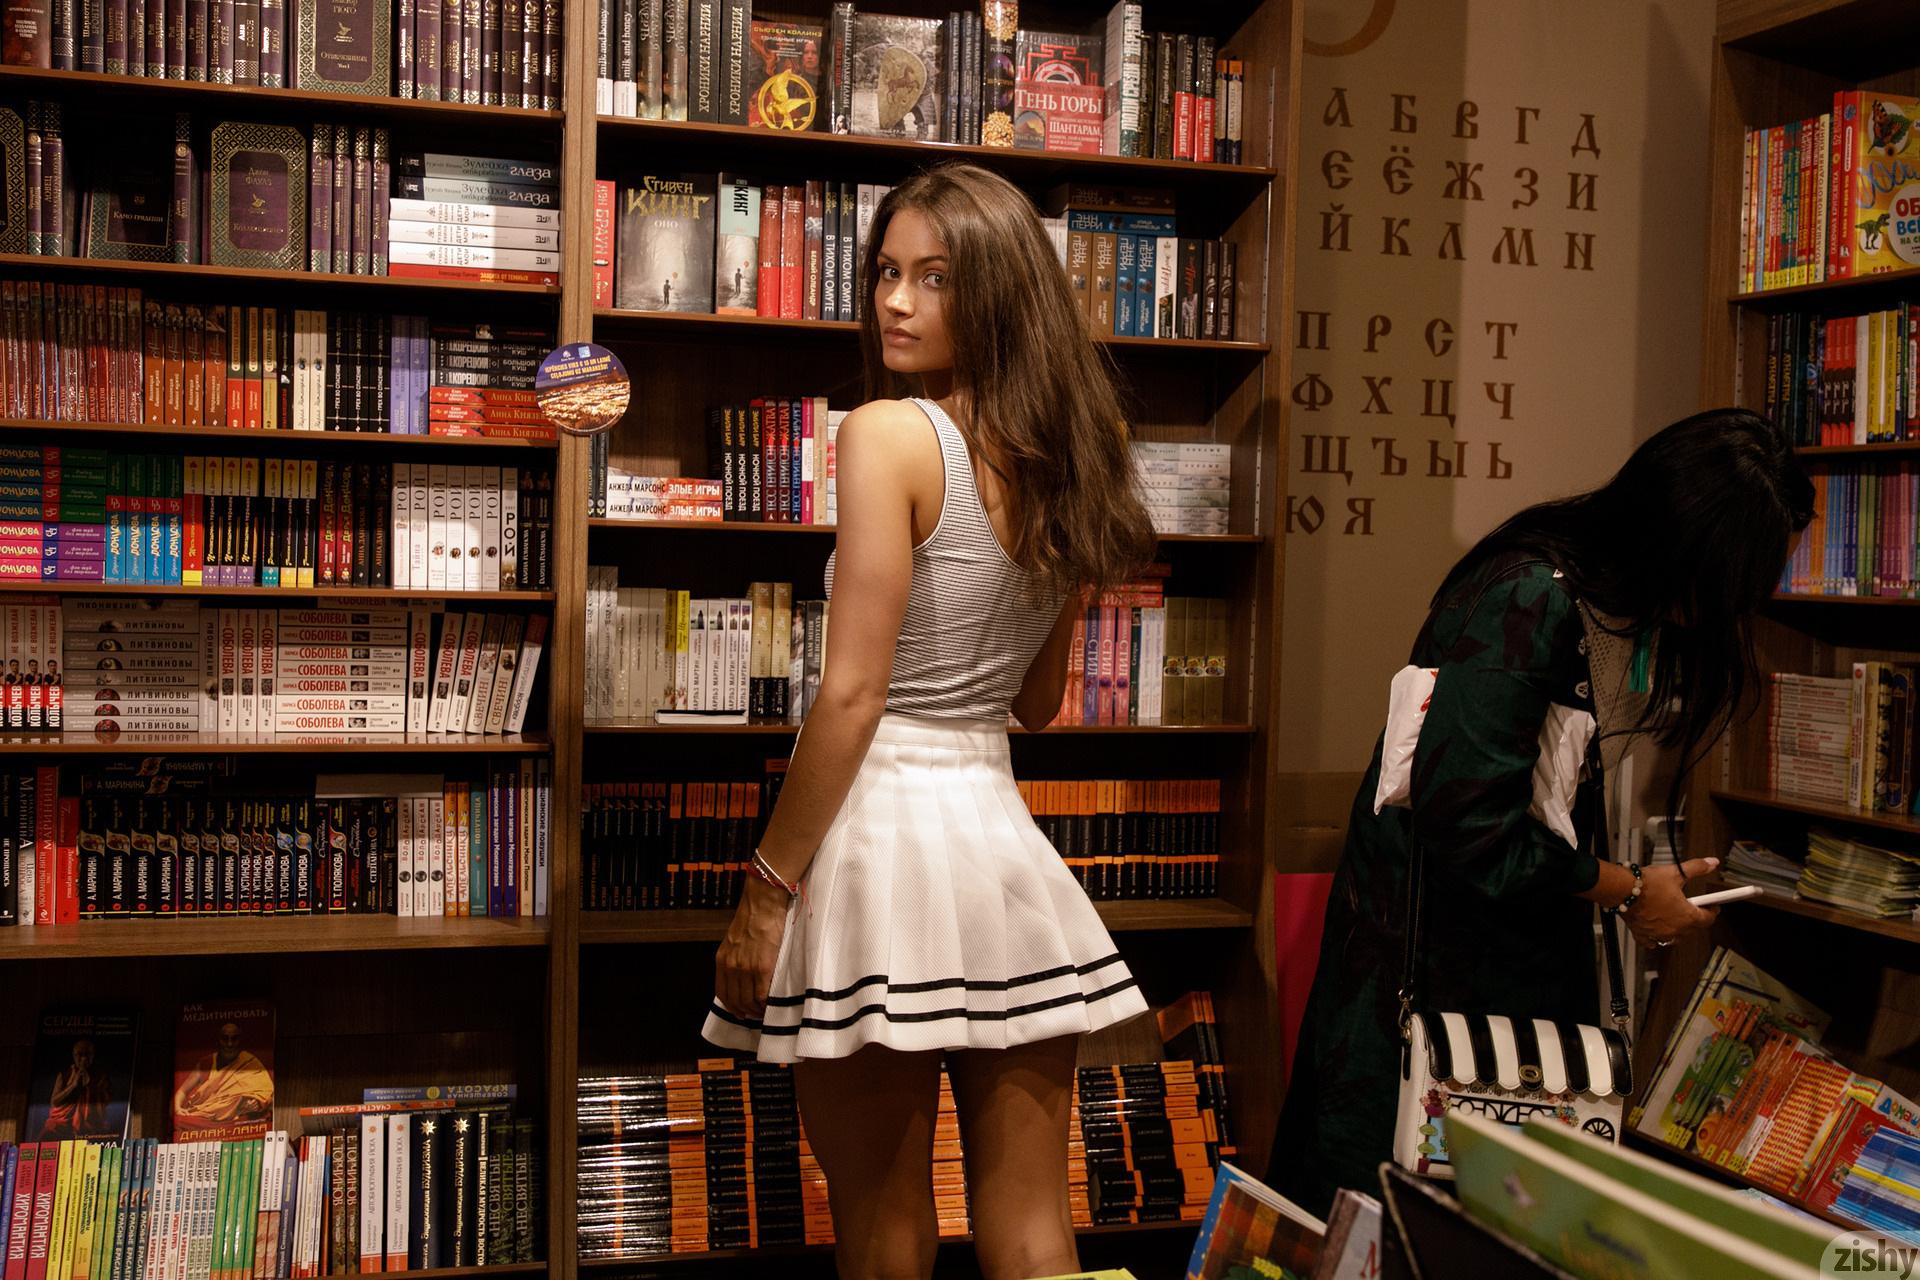 Shyla Volbeck Shopping With The Devil Zishy (81)